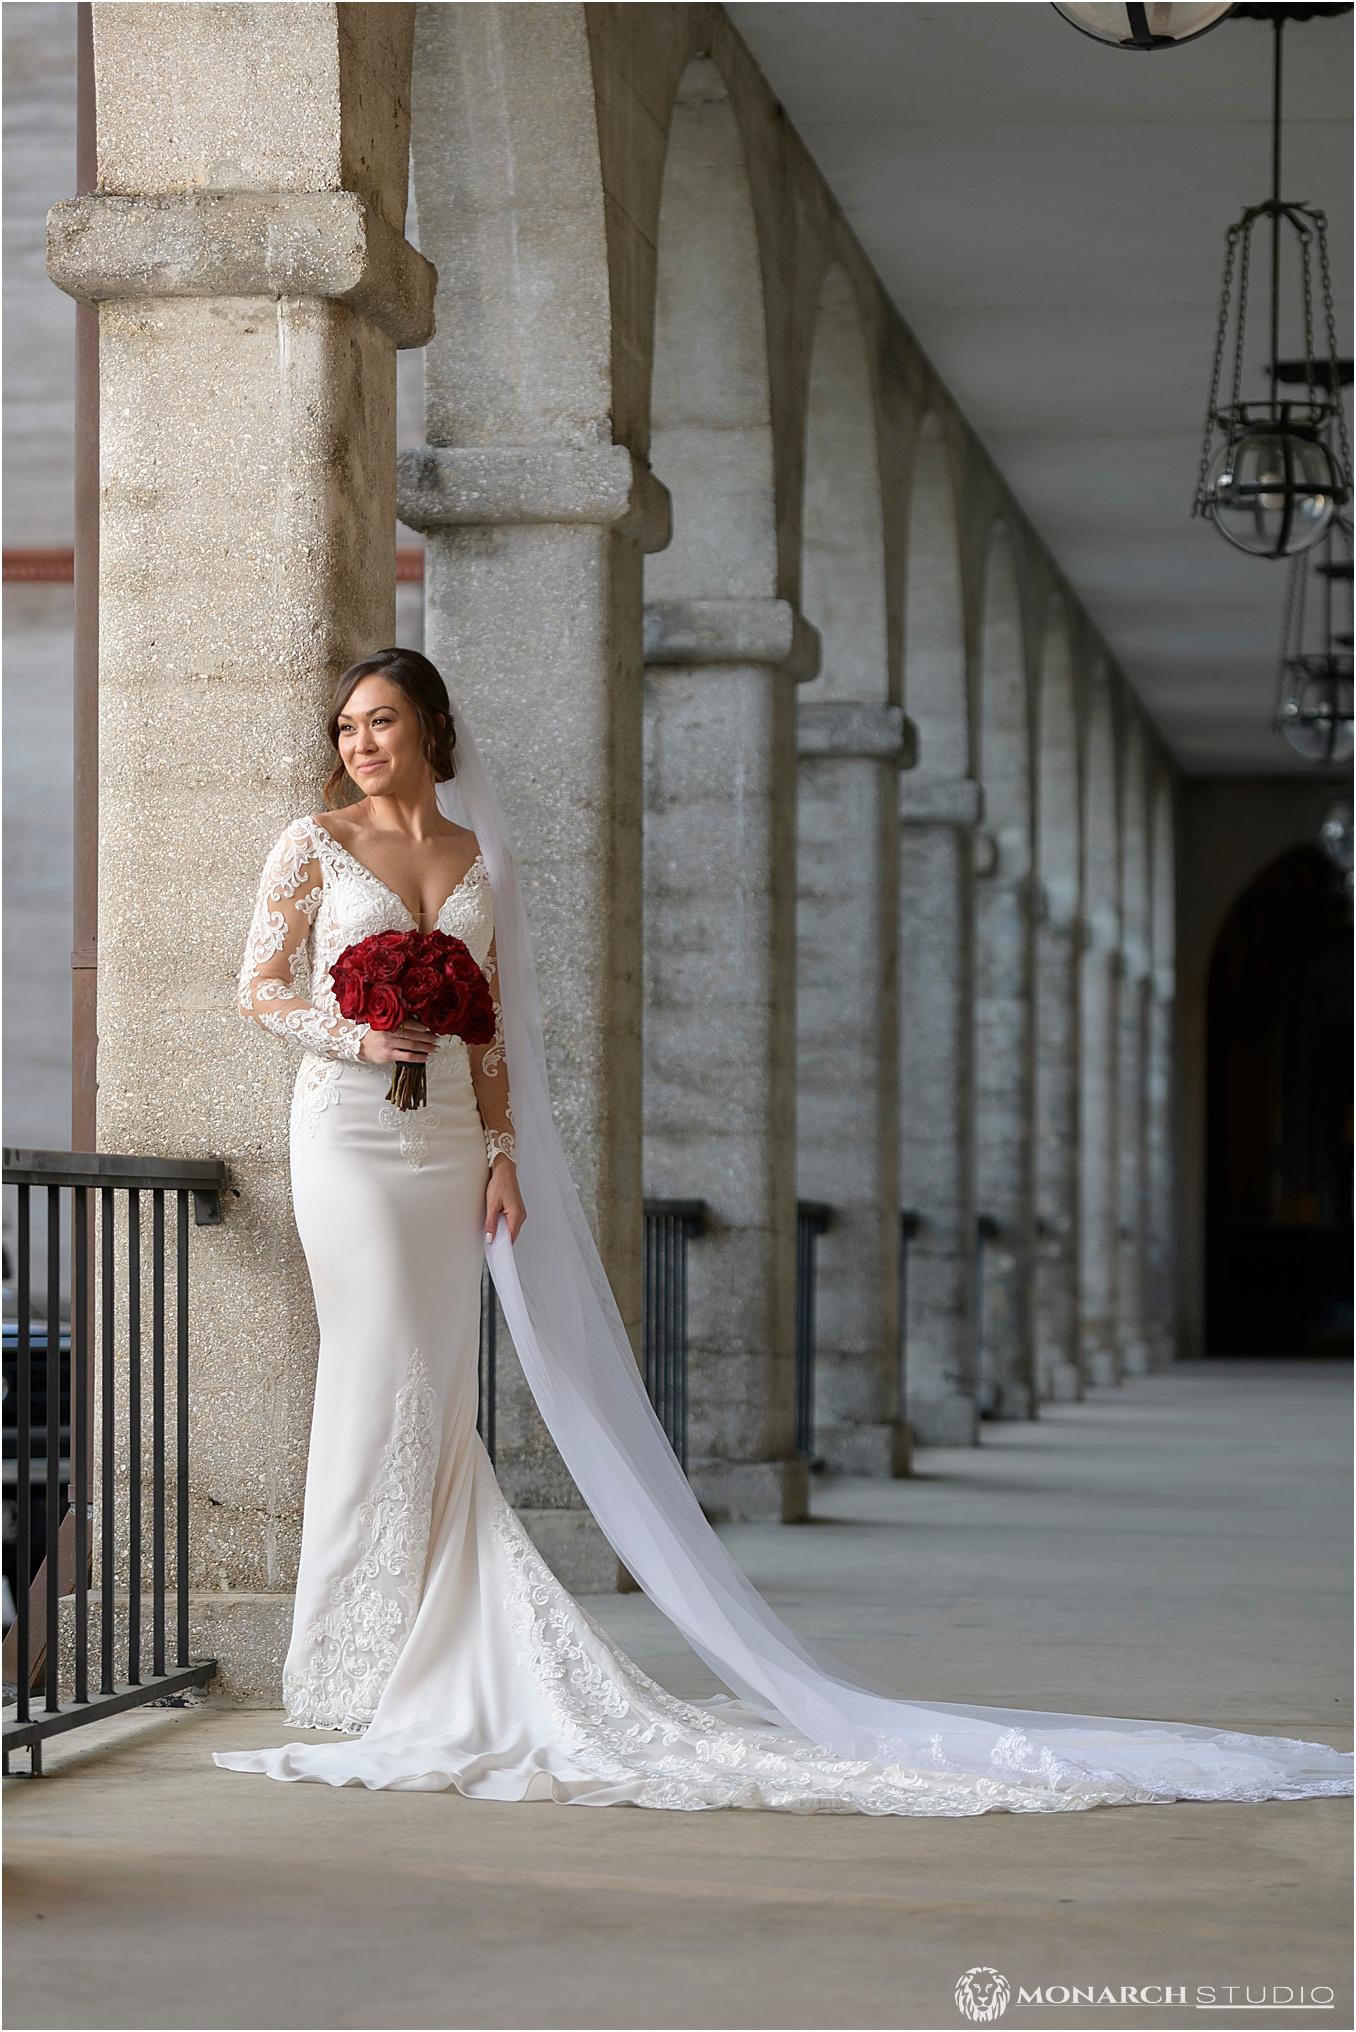 st-augustine-high-end-wedding-photographers-087.jpg